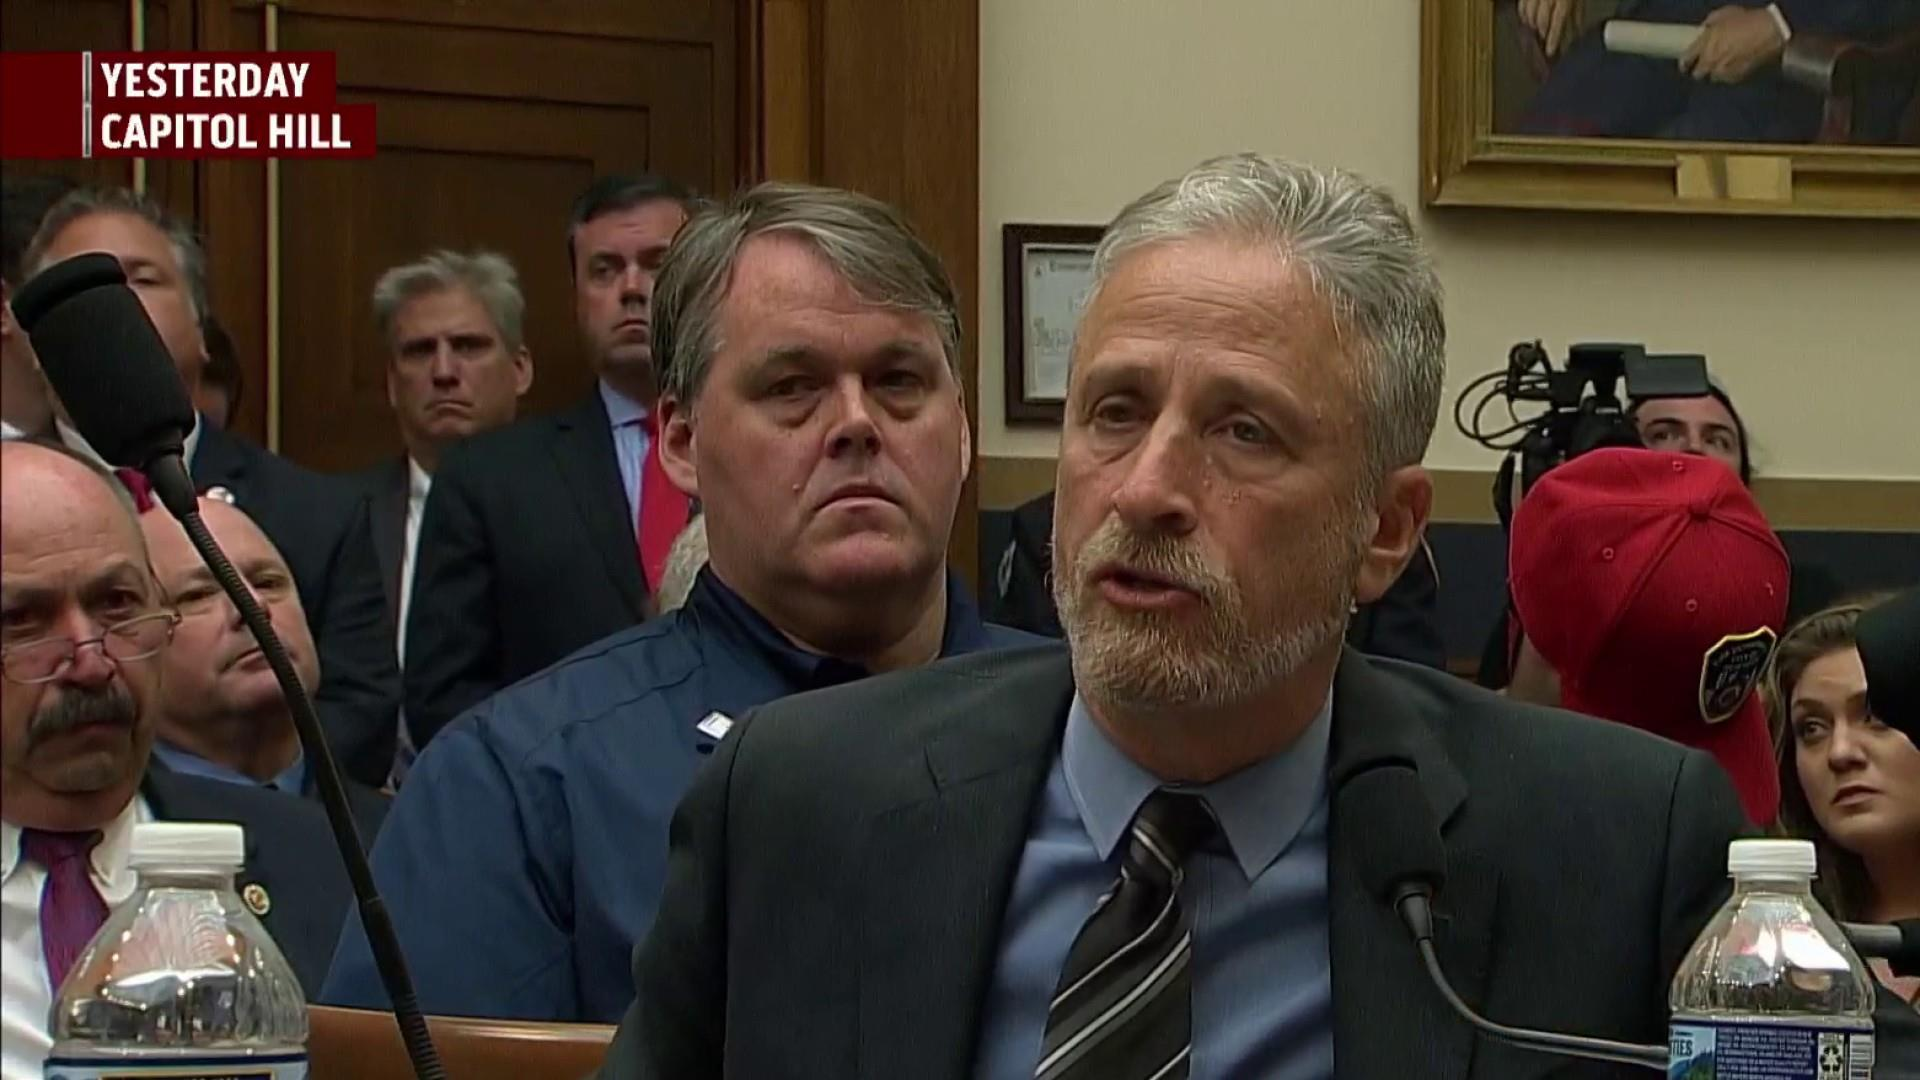 Geist: Holding Congress accountable is Jon Stewart's greatest legacy